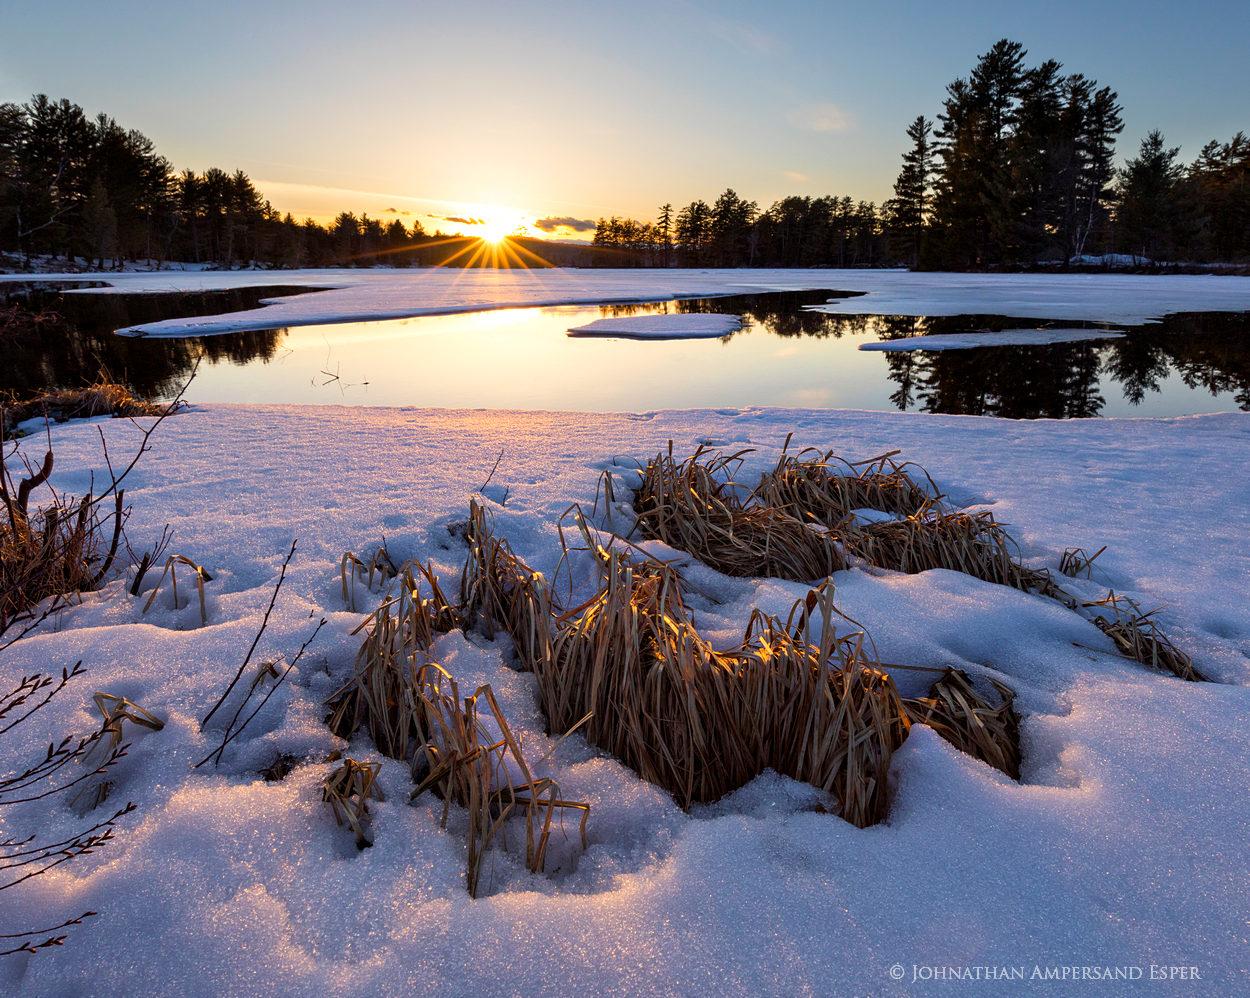 Jennings Park Pond,Long Lake,Park Pond,Jennings Pond,April,ice,spring,, photo